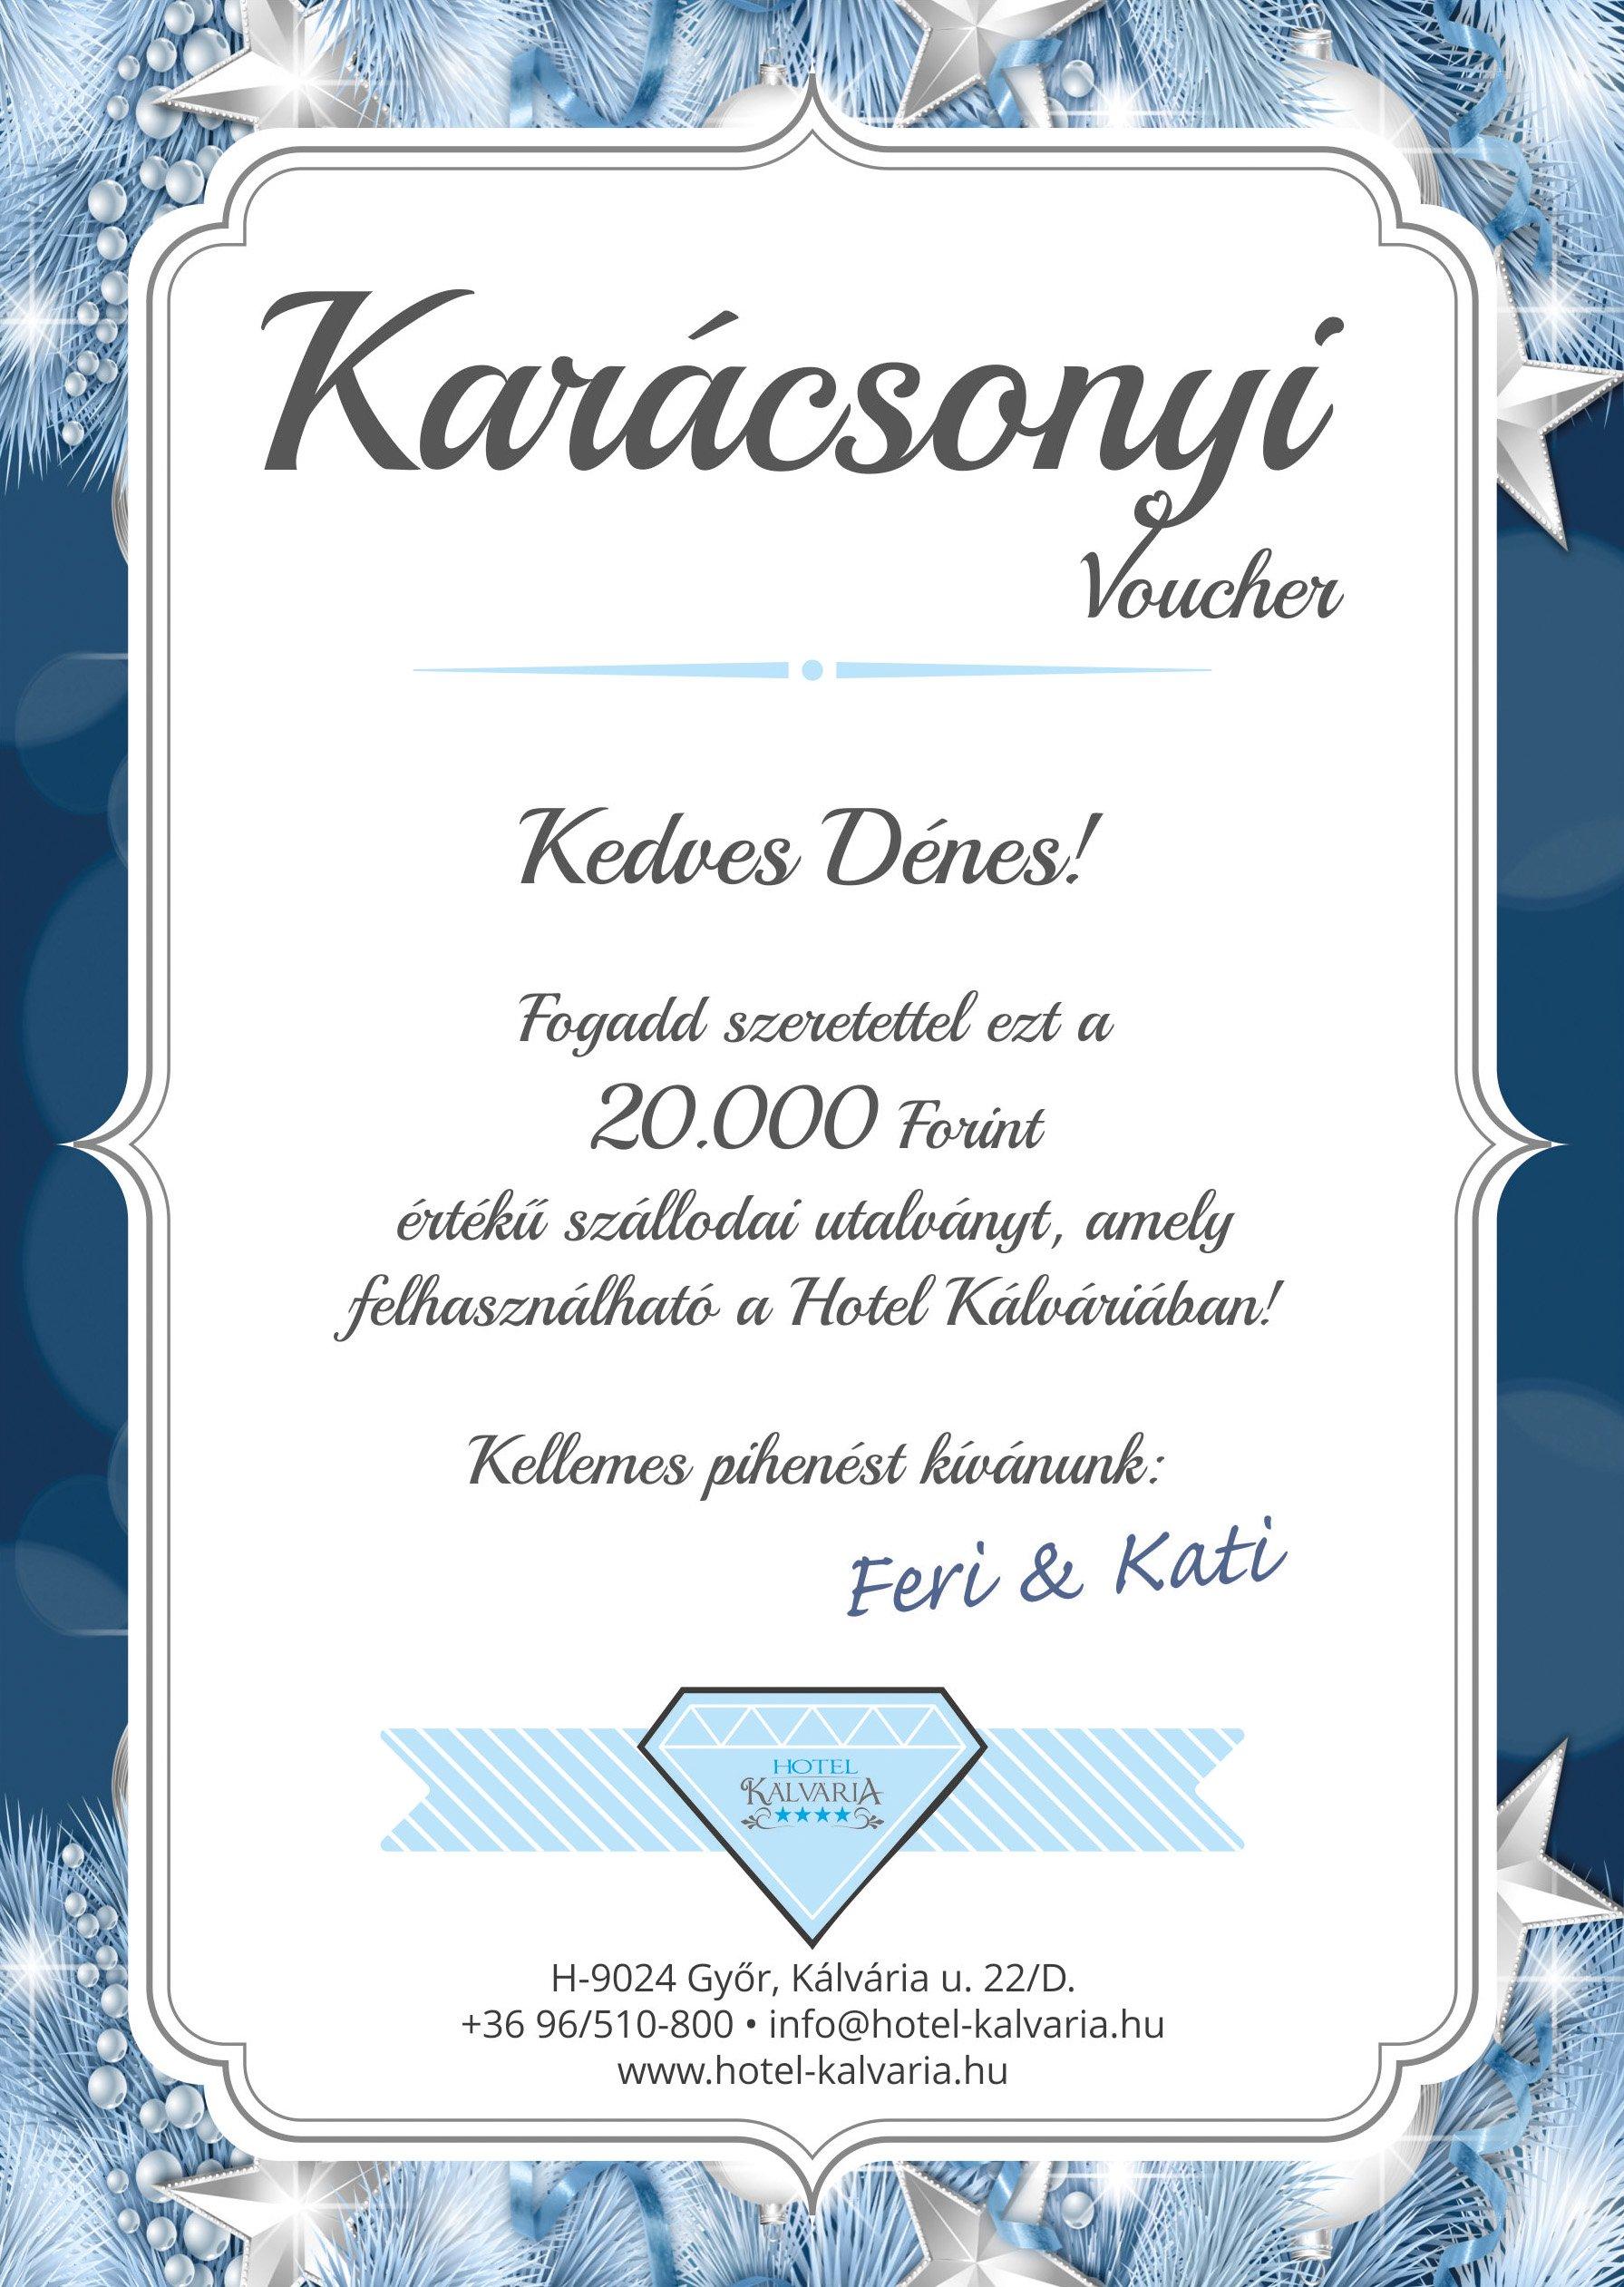 kalvaria_hotel_voucher_2017_karacsony